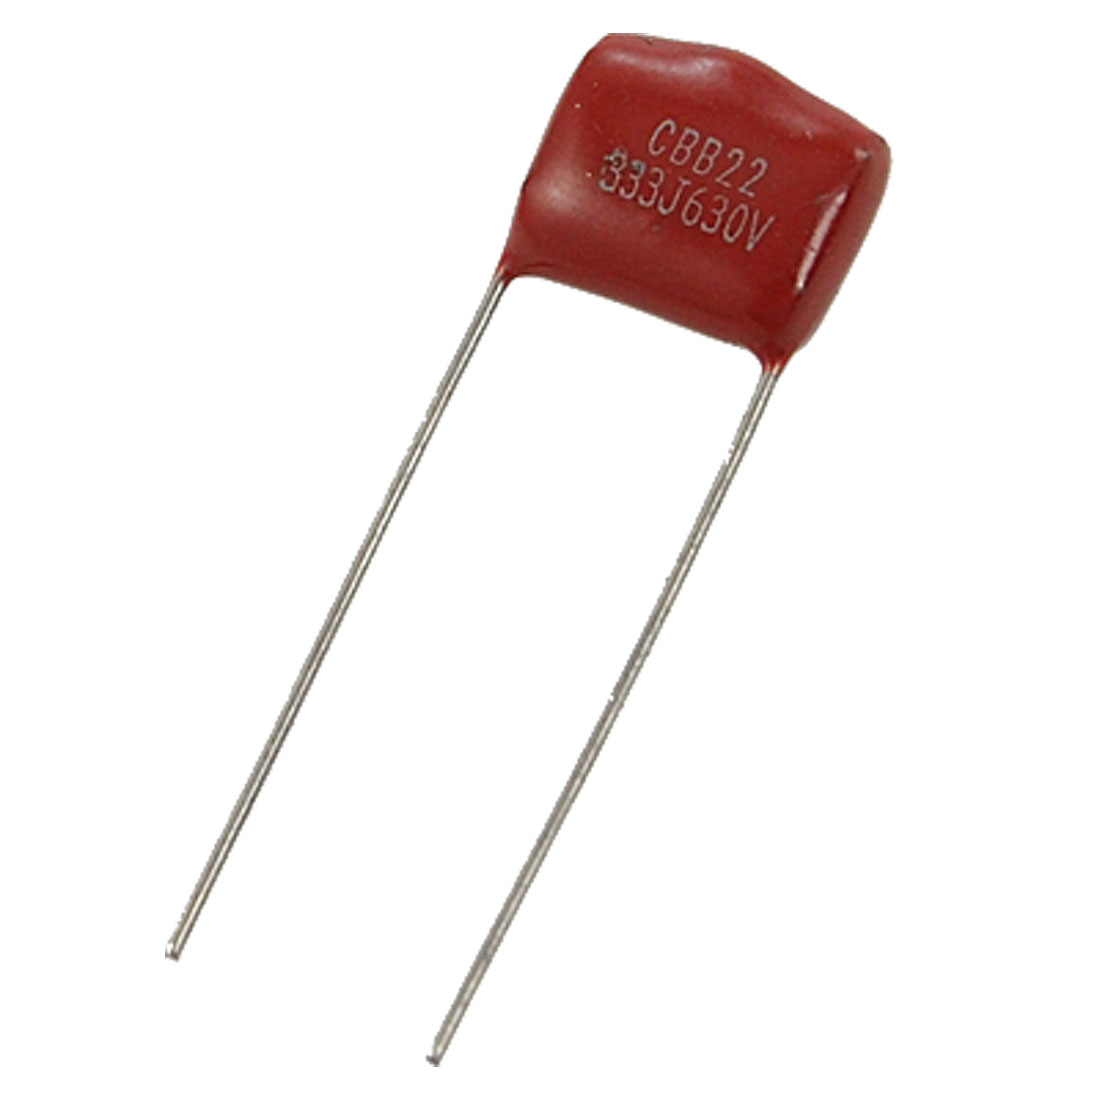 CBB22 0.033uF Metallized Polypropylene Film Capacitors 10 Pcs